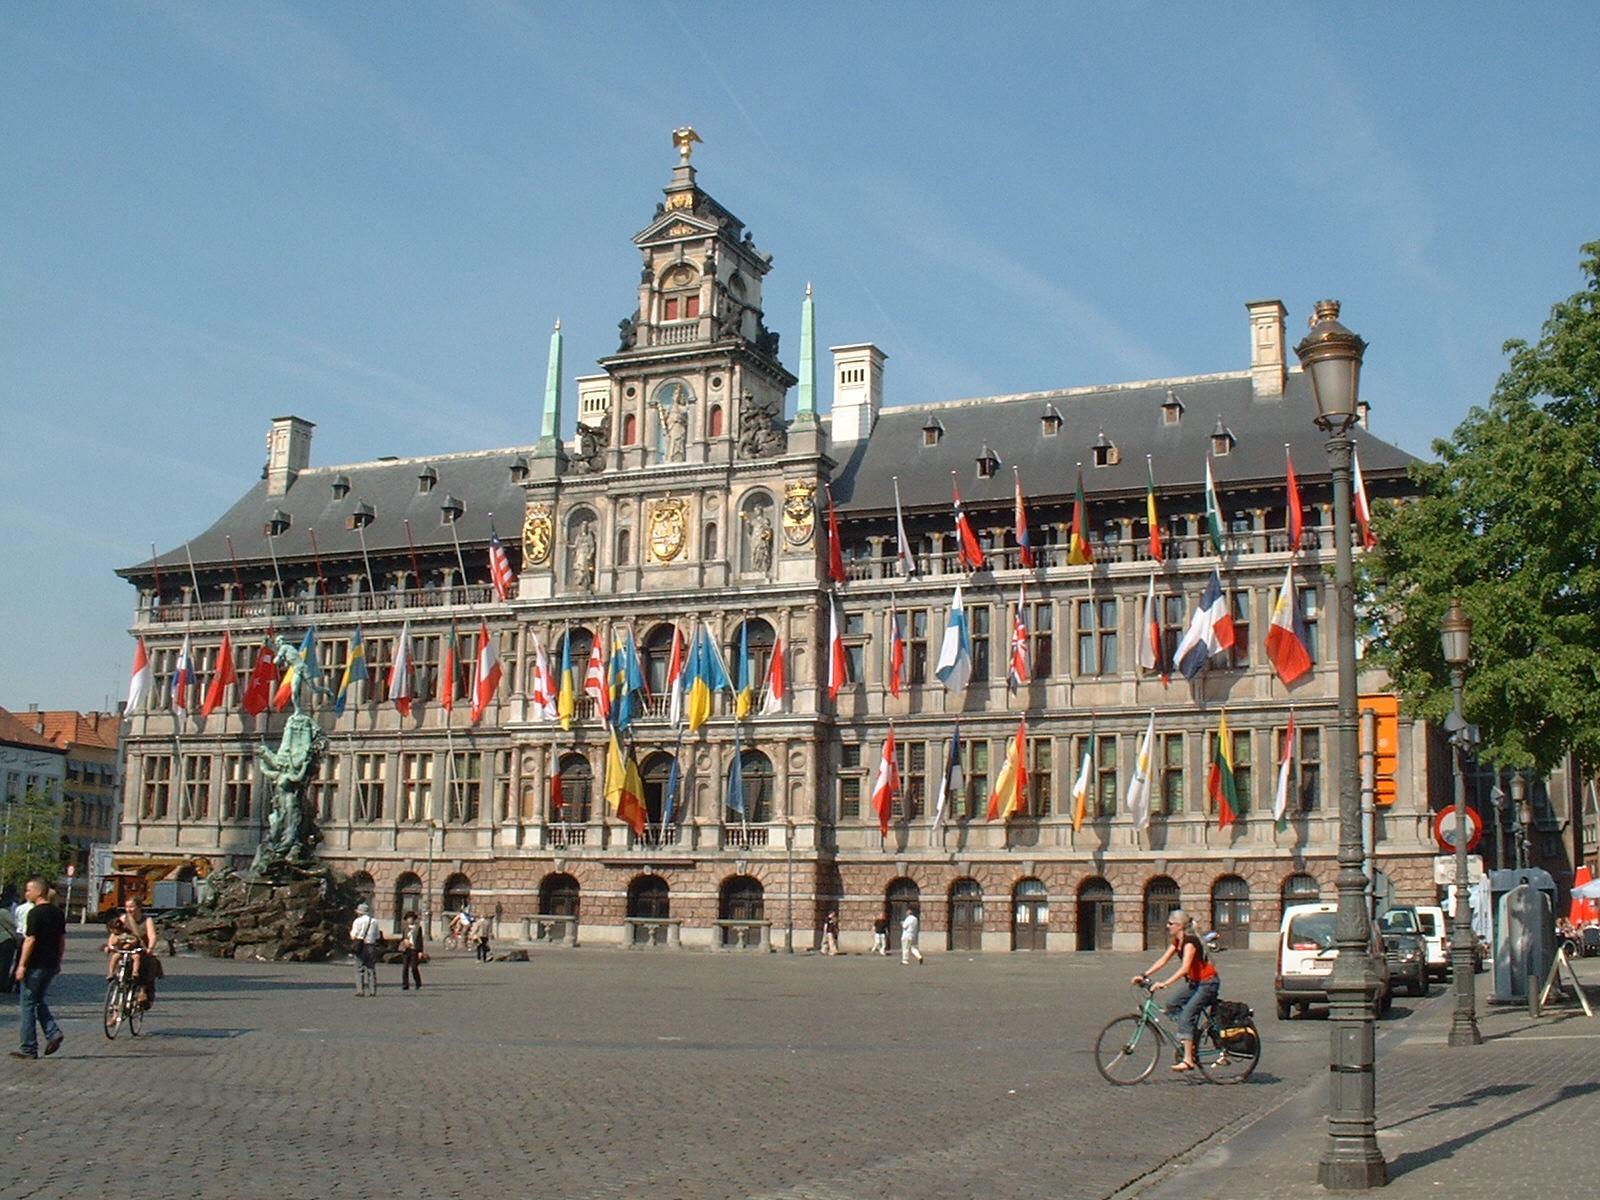 File:Antwerp town hall, 25 april 2007 1.jpg - Wikimedia Commonsantwerp town